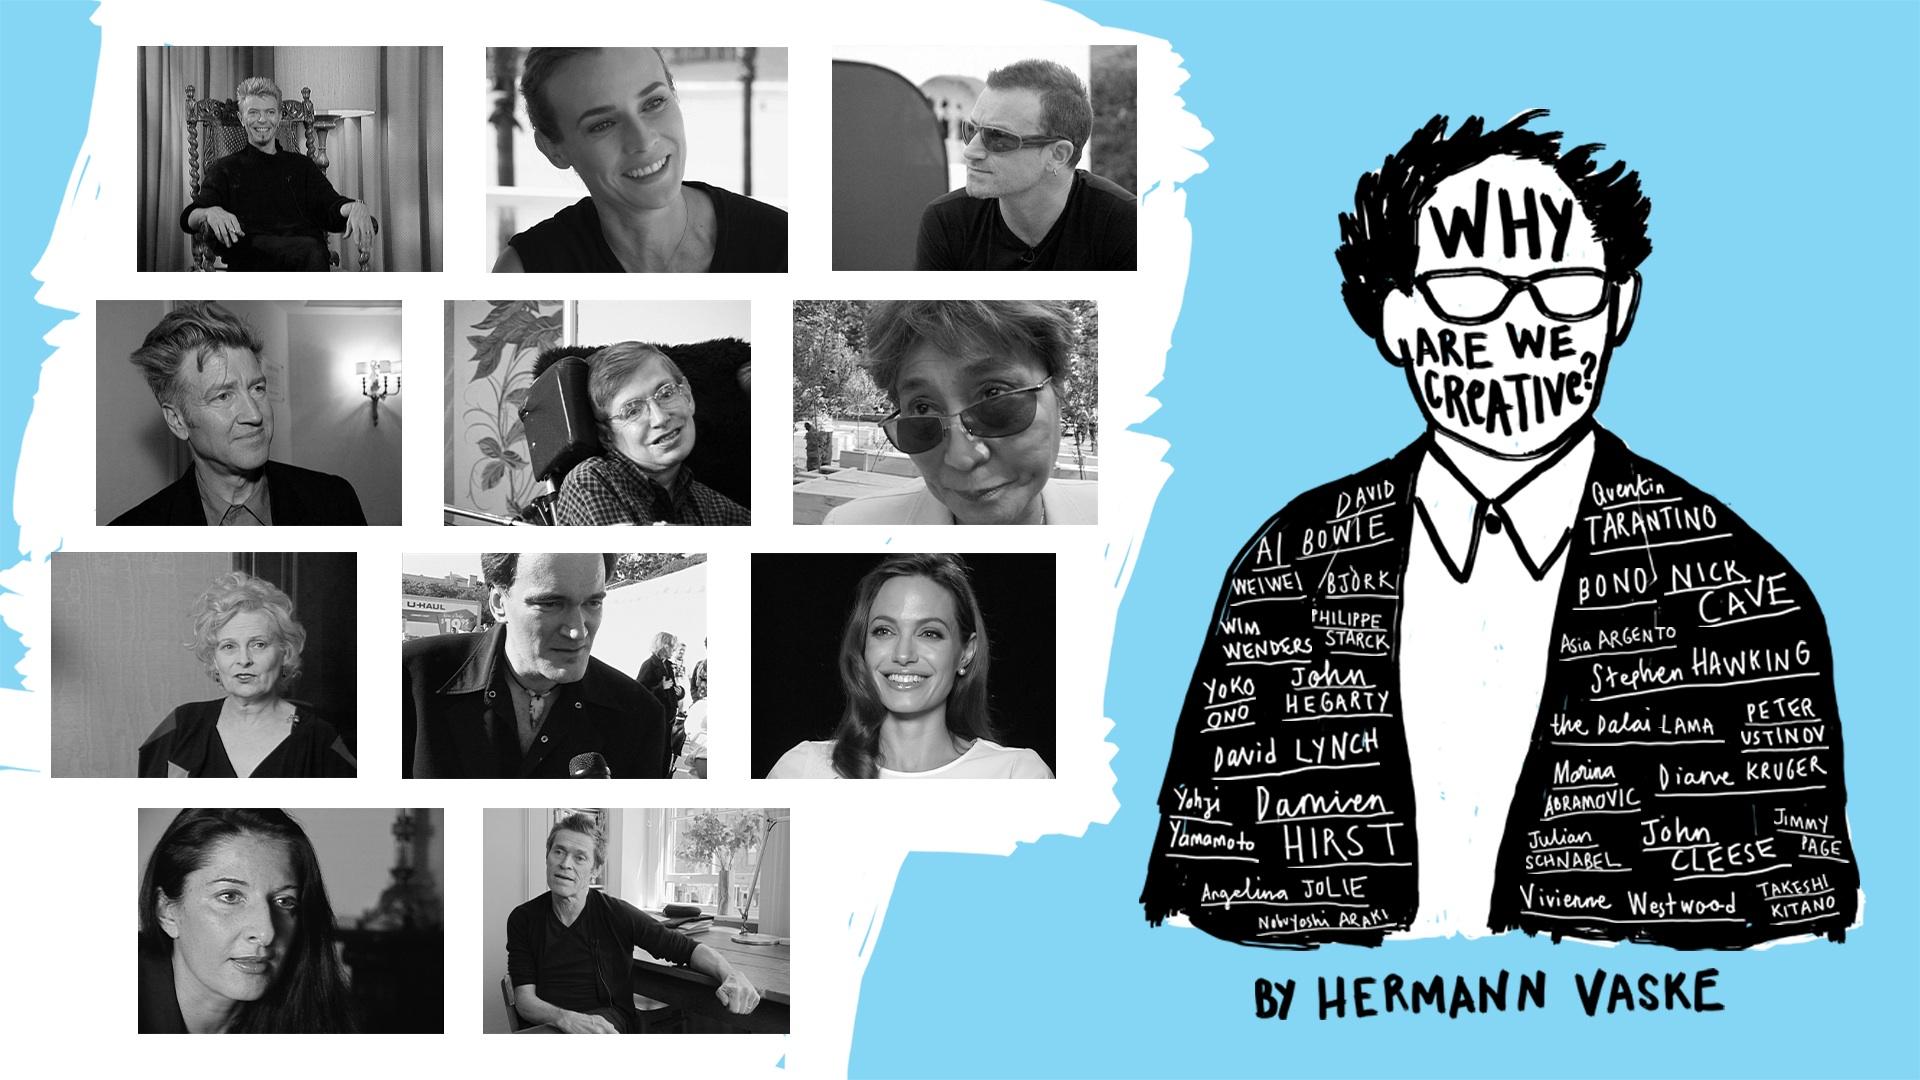 43687 Why are we creative The centipede s dilemma Hermann Vaske film still 3